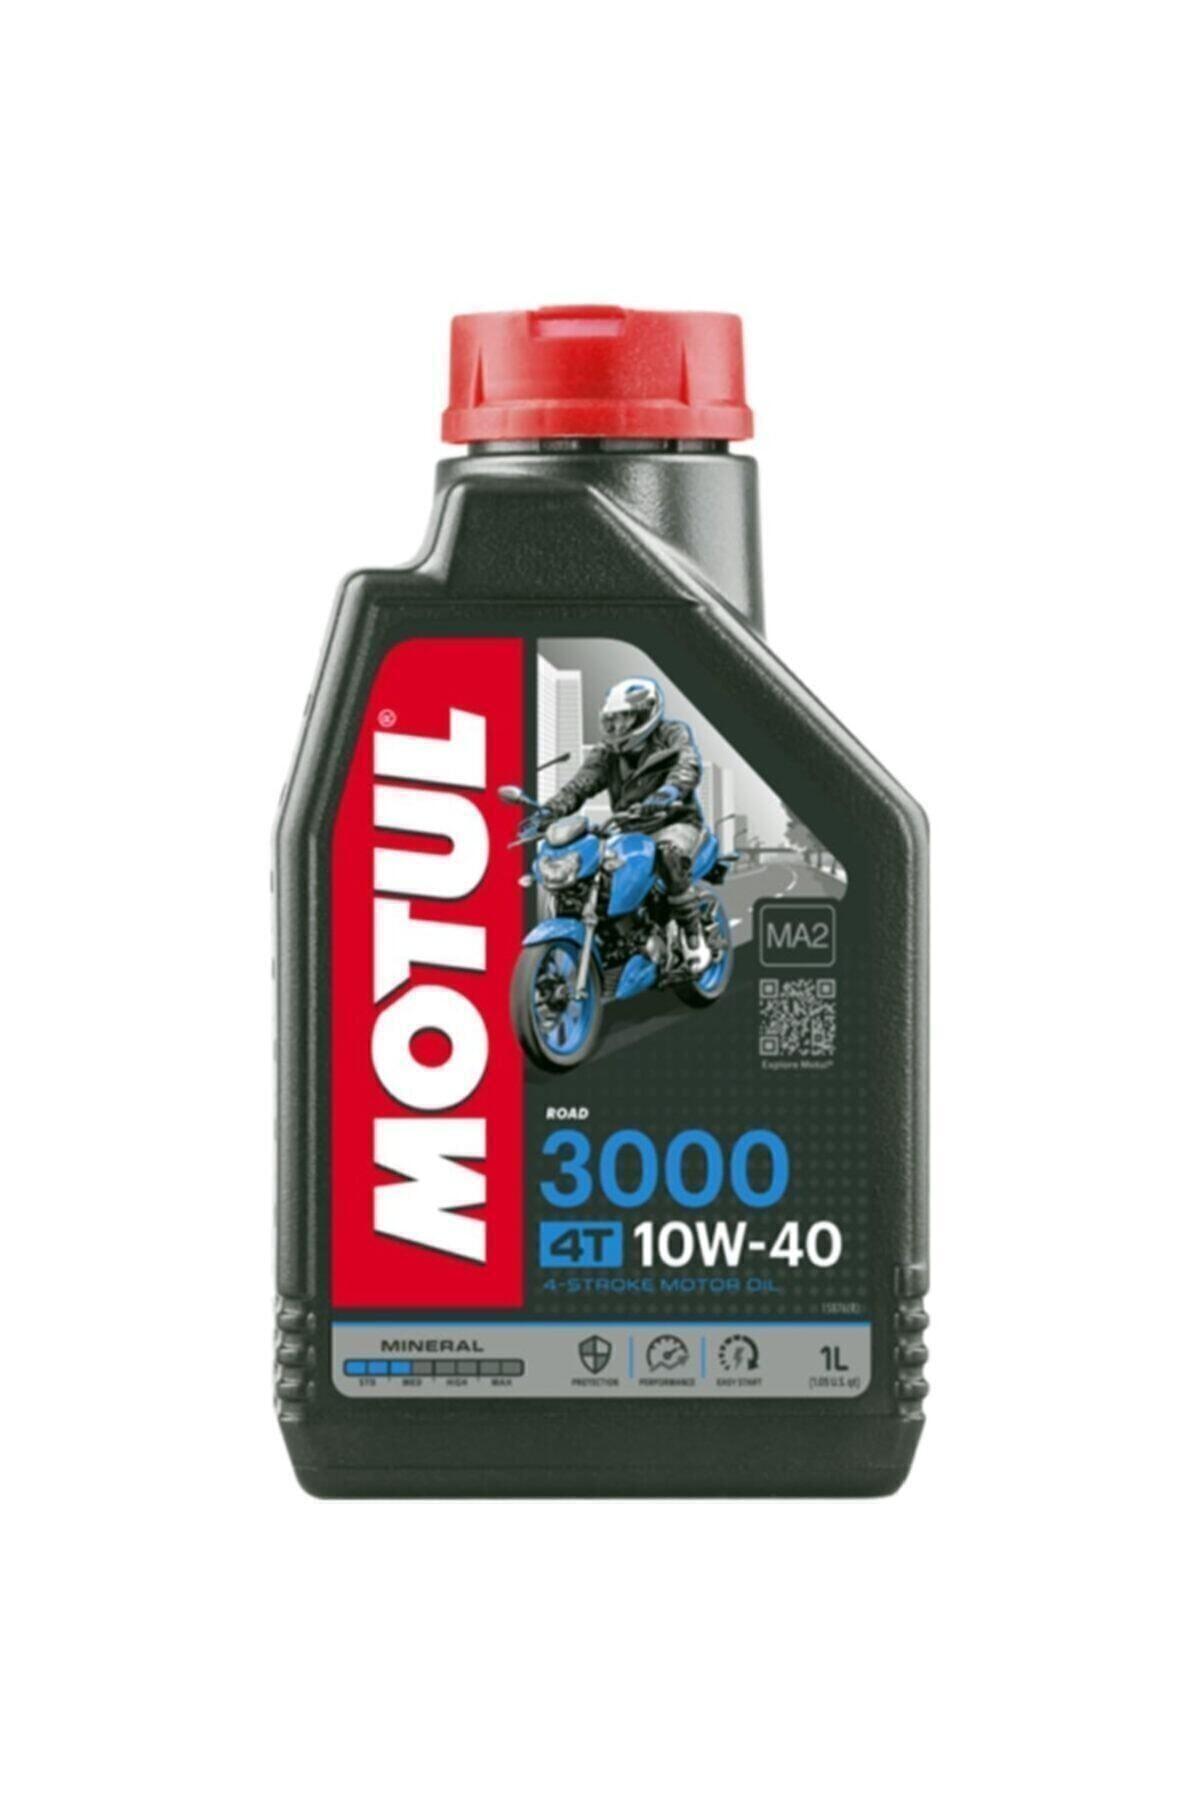 3000 10w40 4t Mineral Motosiklet Motor Yağı 2020 Yeni Üretim